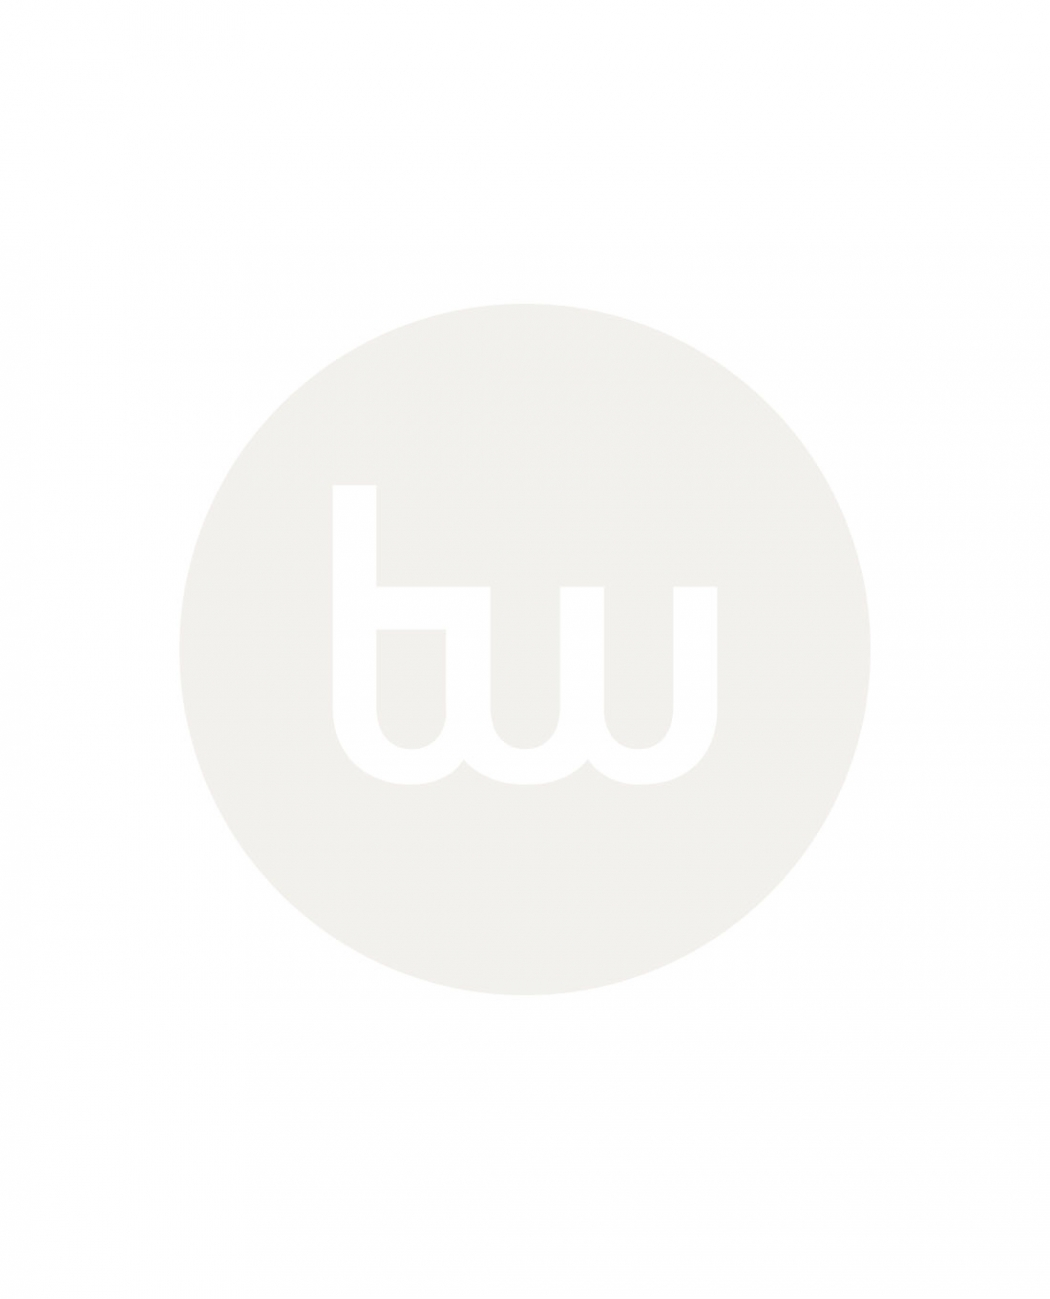 16b1f02b40 5.11 Tactical Climb Polarized Eyewear - TACWRK